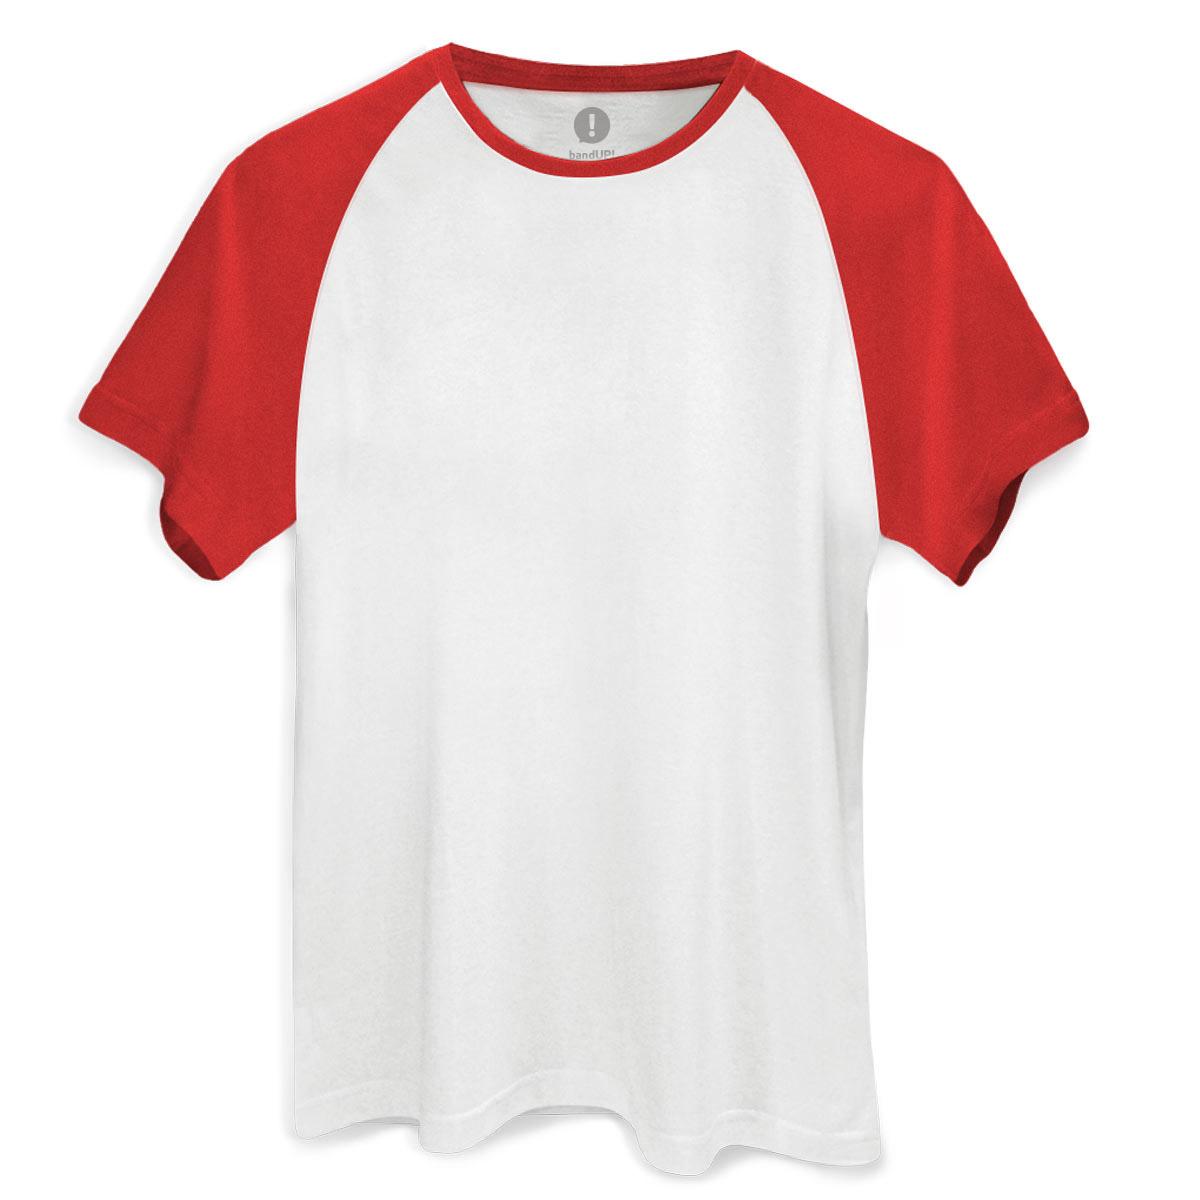 Camiseta Raglan Premium Masculina Branco e Vermelho